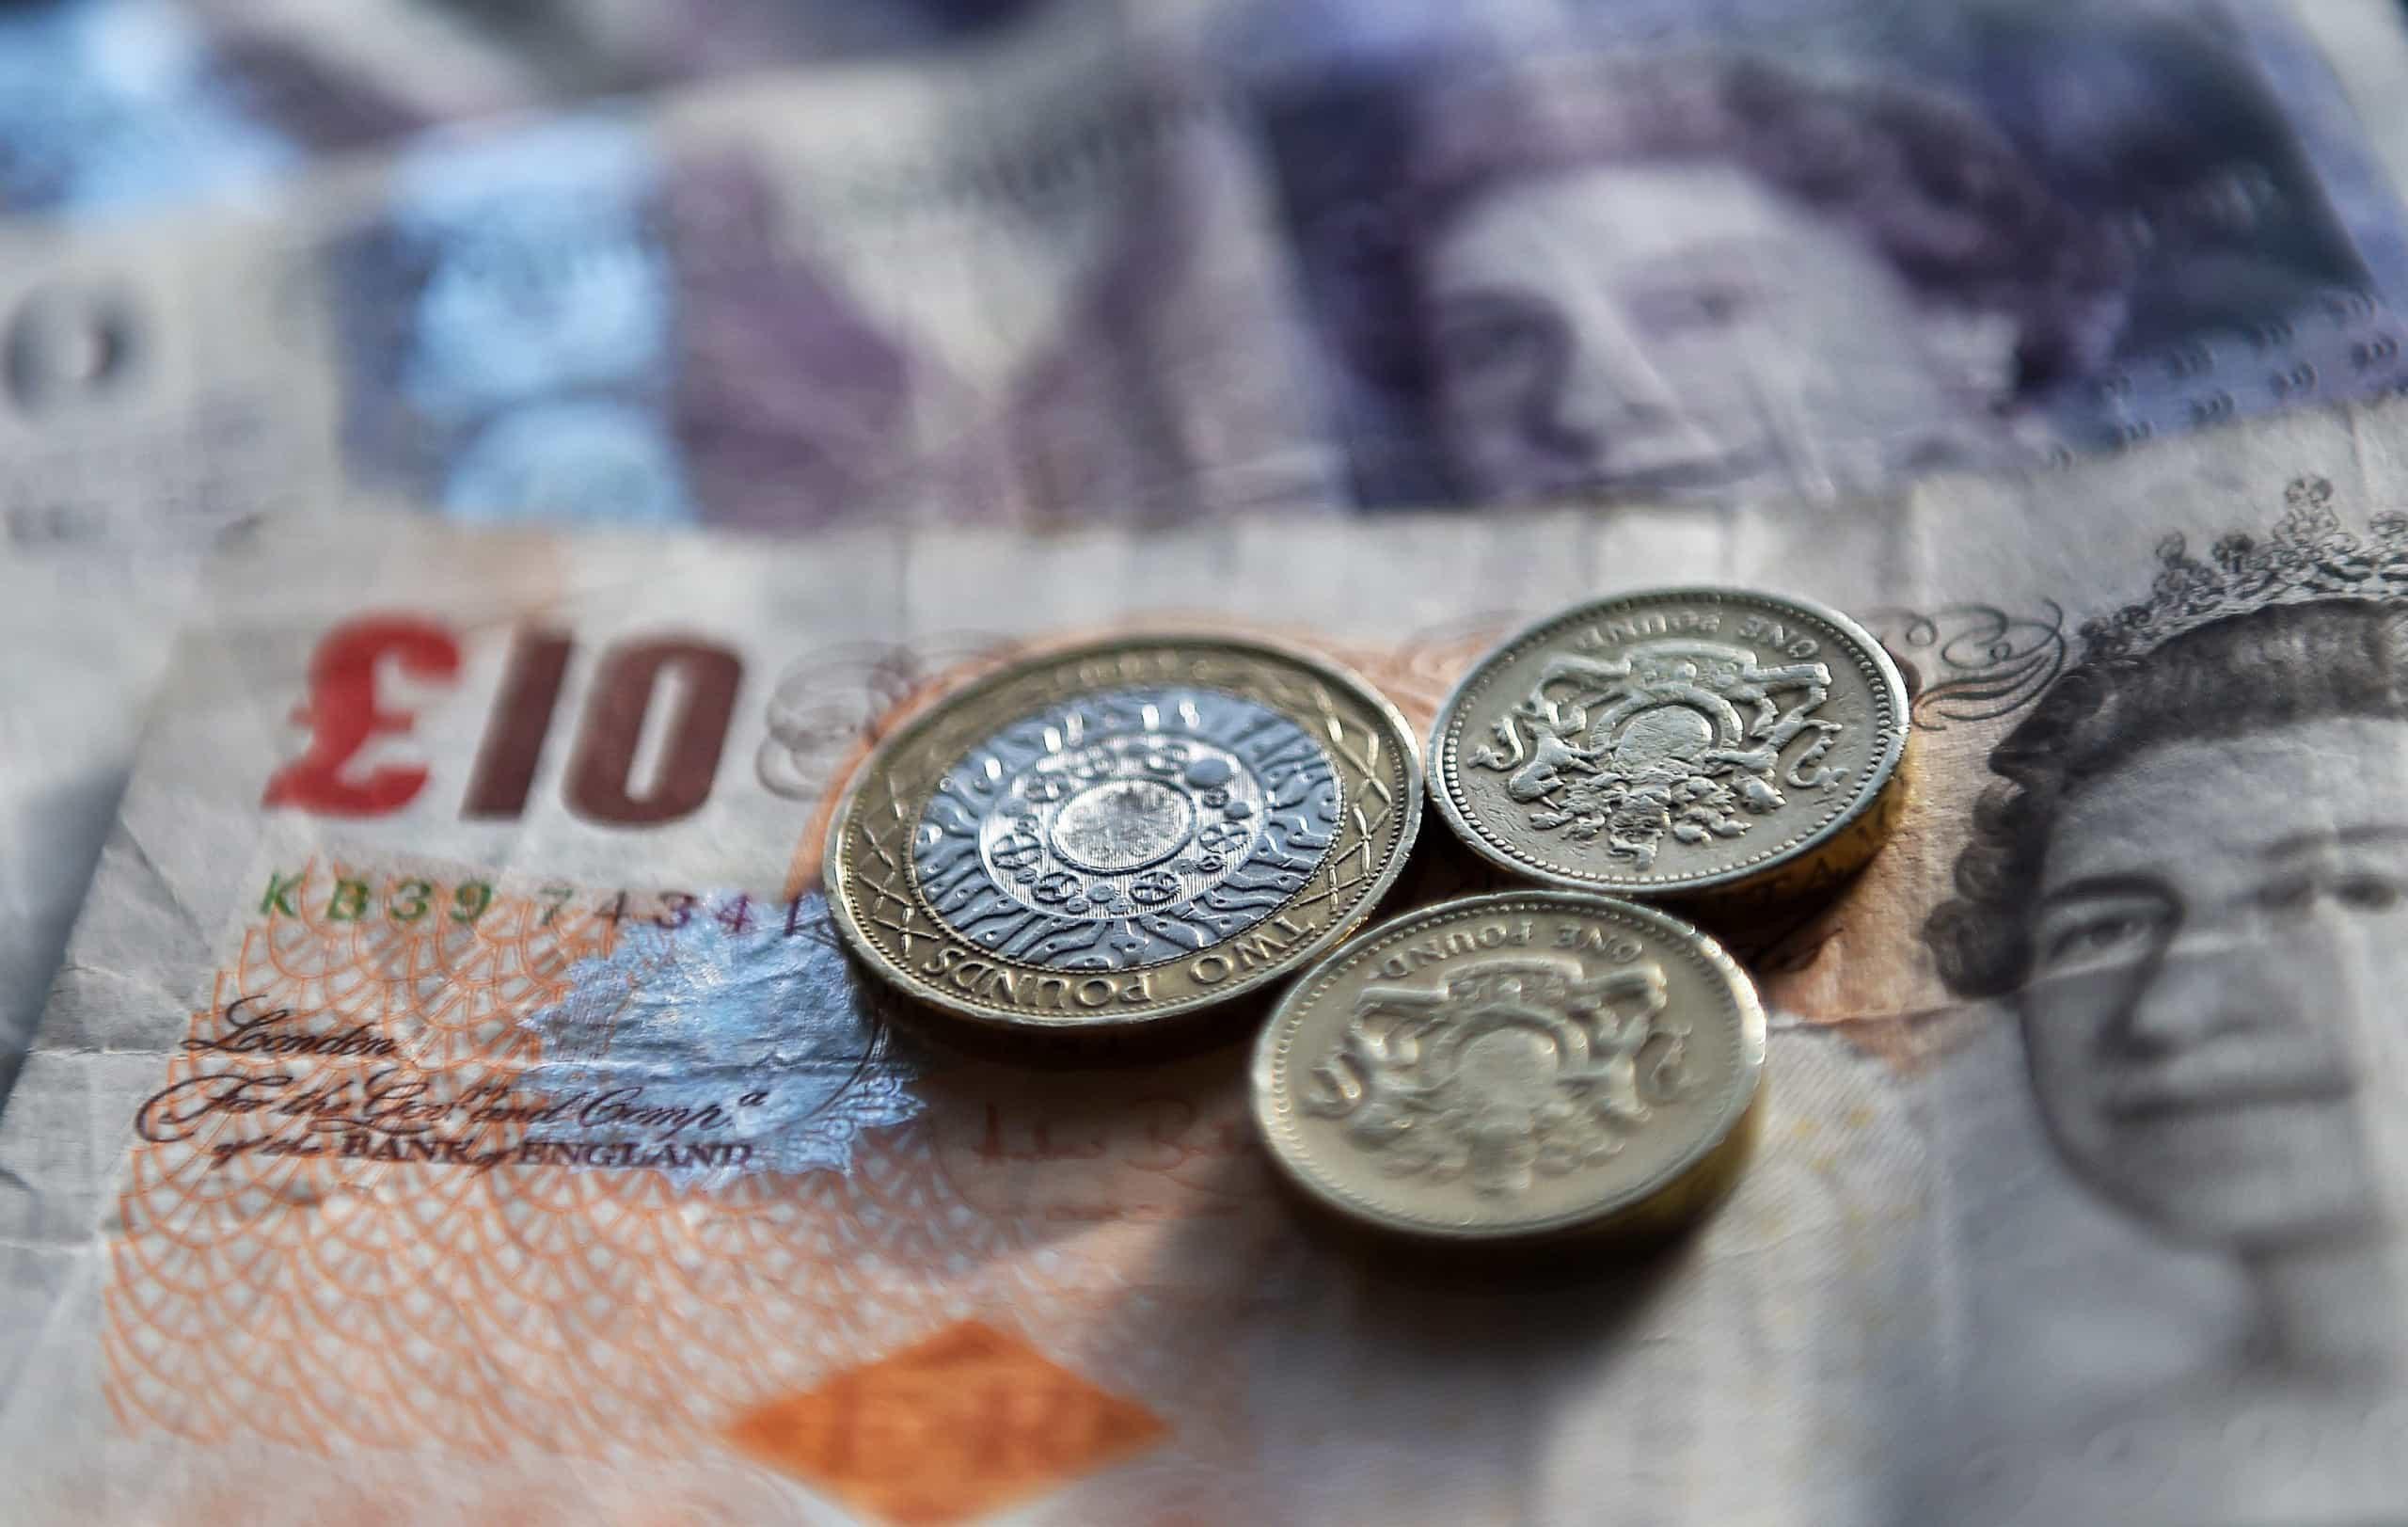 Libra esterlina alcança máximo face ao euro desde o referendo de 2016